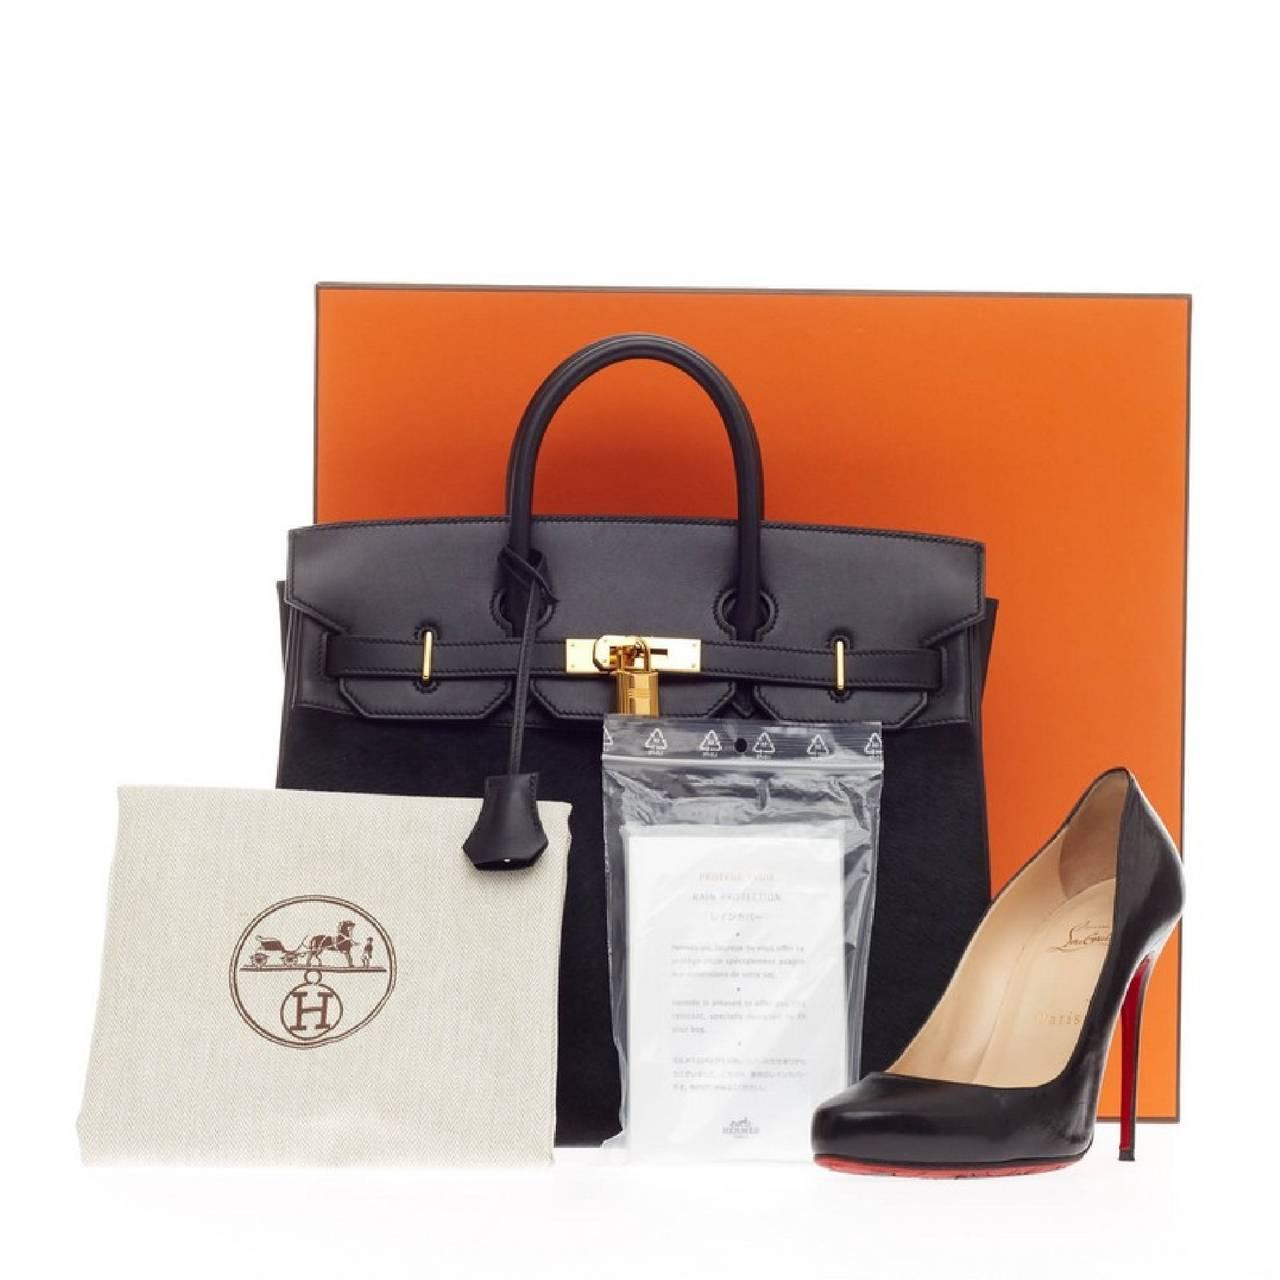 berkin bag price - hermes vermillion togo kelly 28cm gold hardware, cheap hermes bags ...